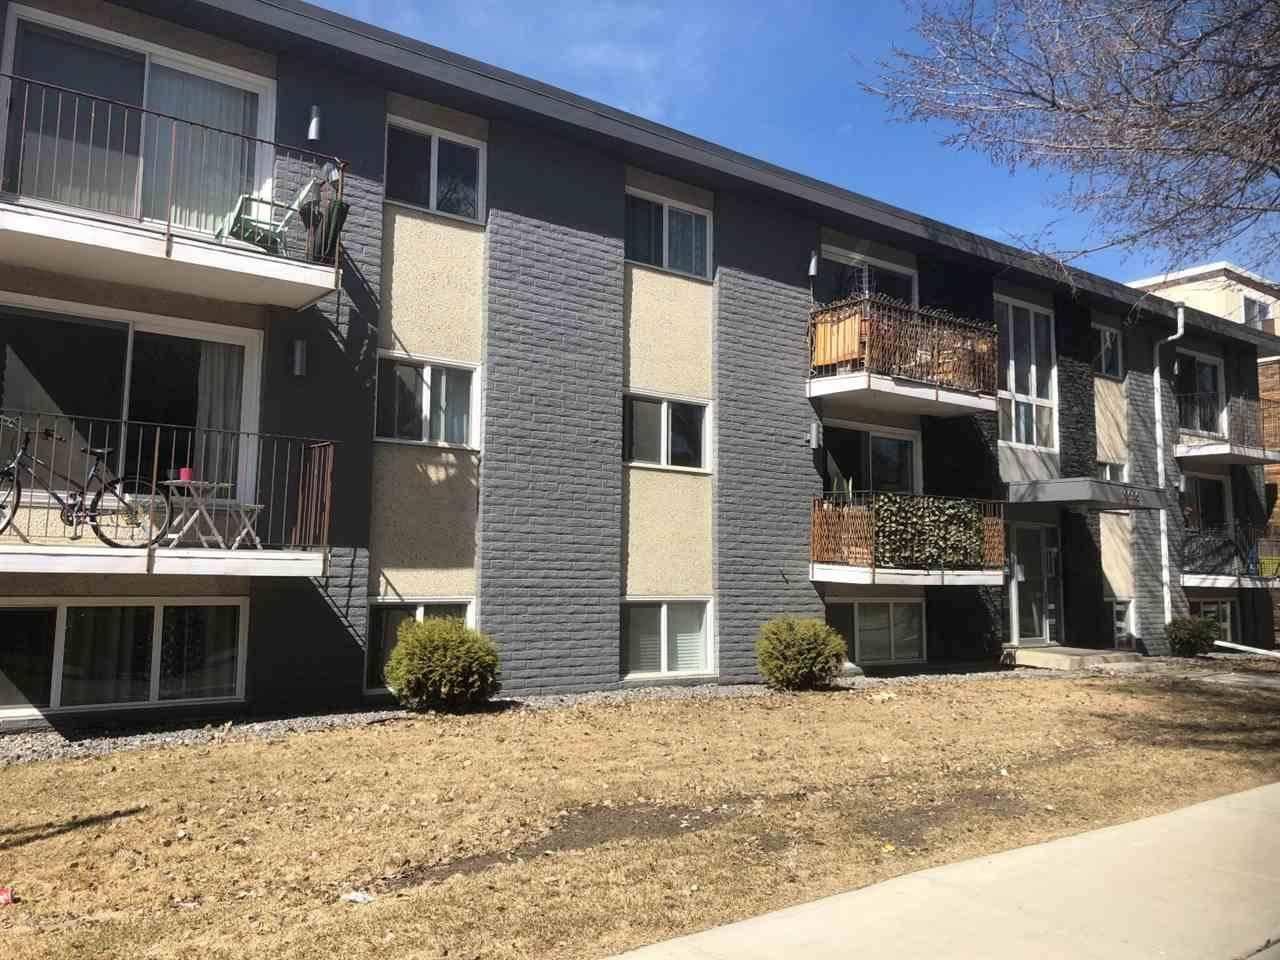 106 - 10606 123 Street Nw, Edmonton | Image 1